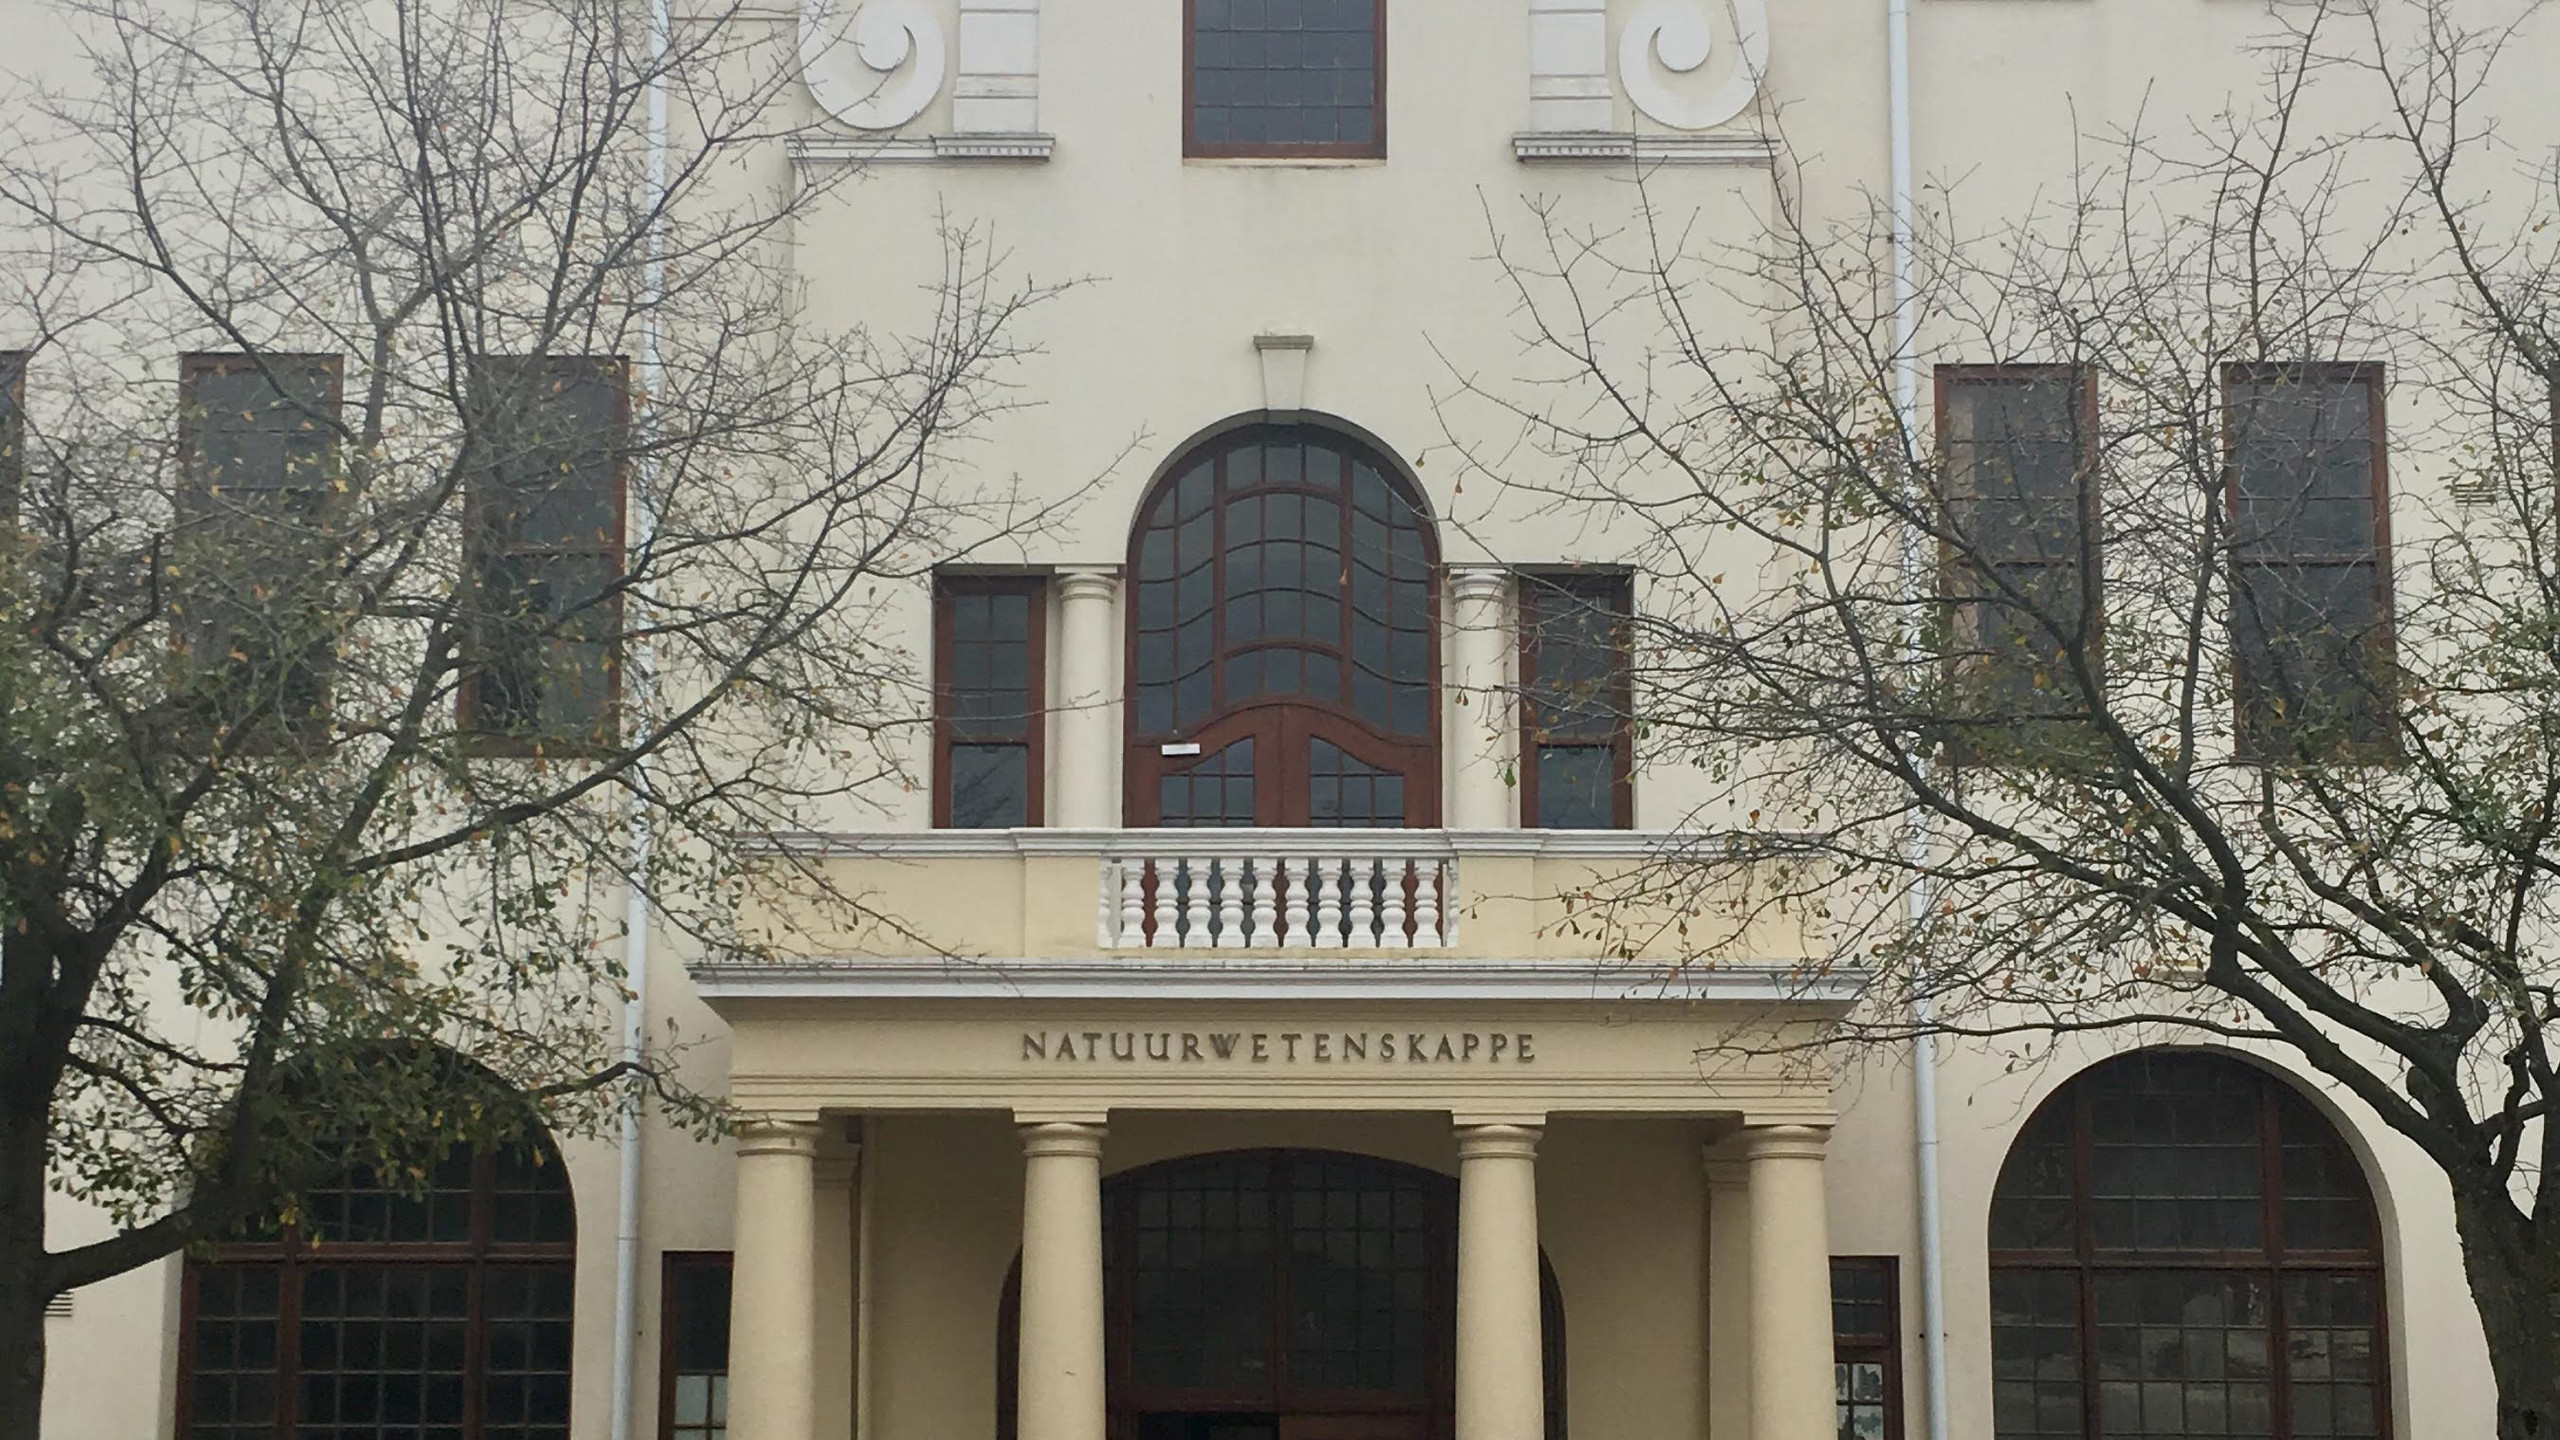 My new building at Stellenbosch University